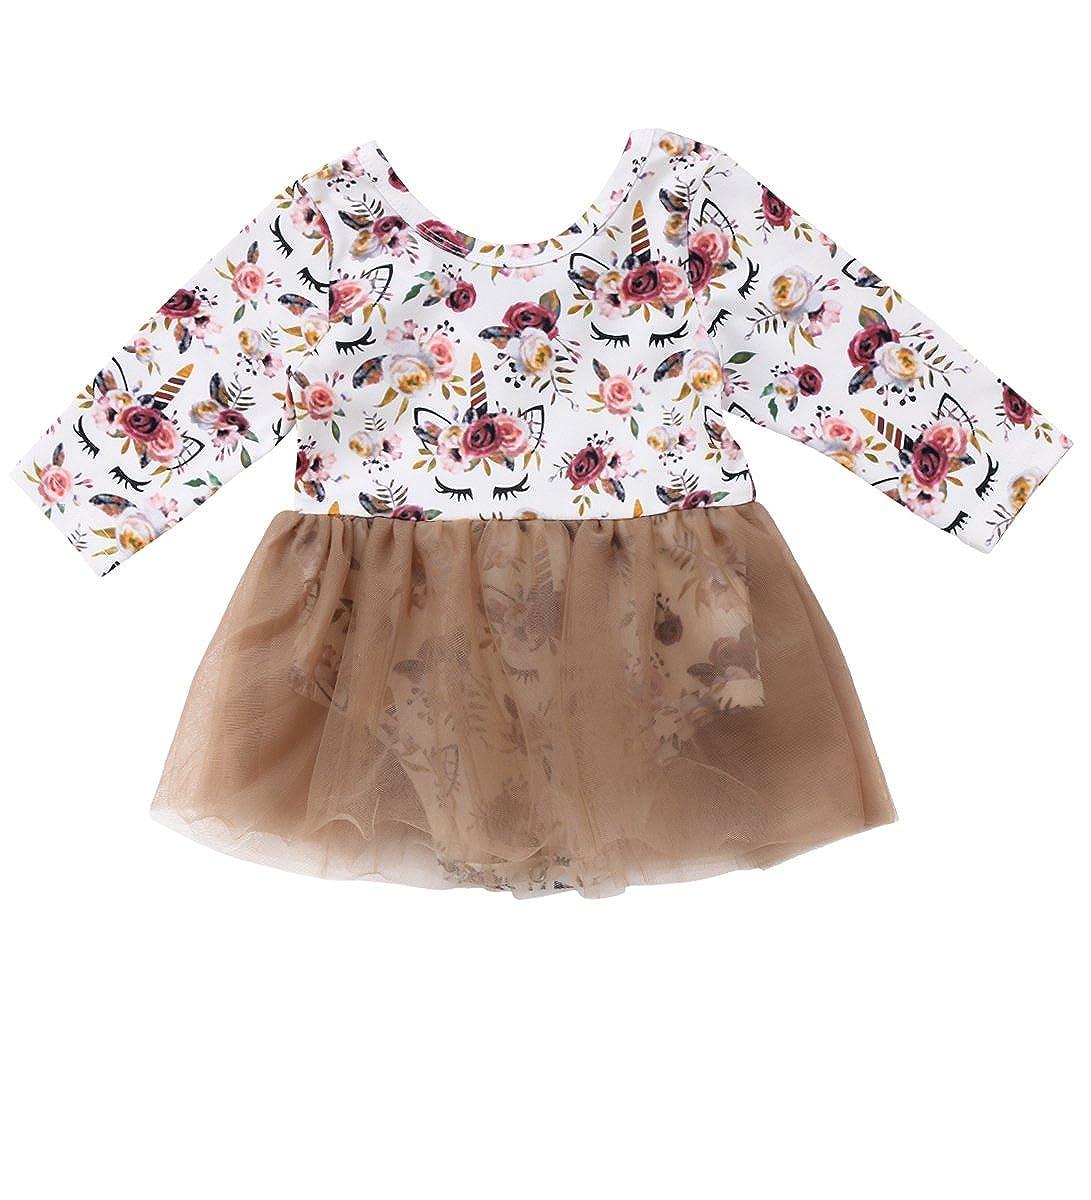 16b4a33105b Amazon.com  Newborn Baby Girls Unicorn Floral Romper Tutu Dress Outfit  Clothing  Clothing